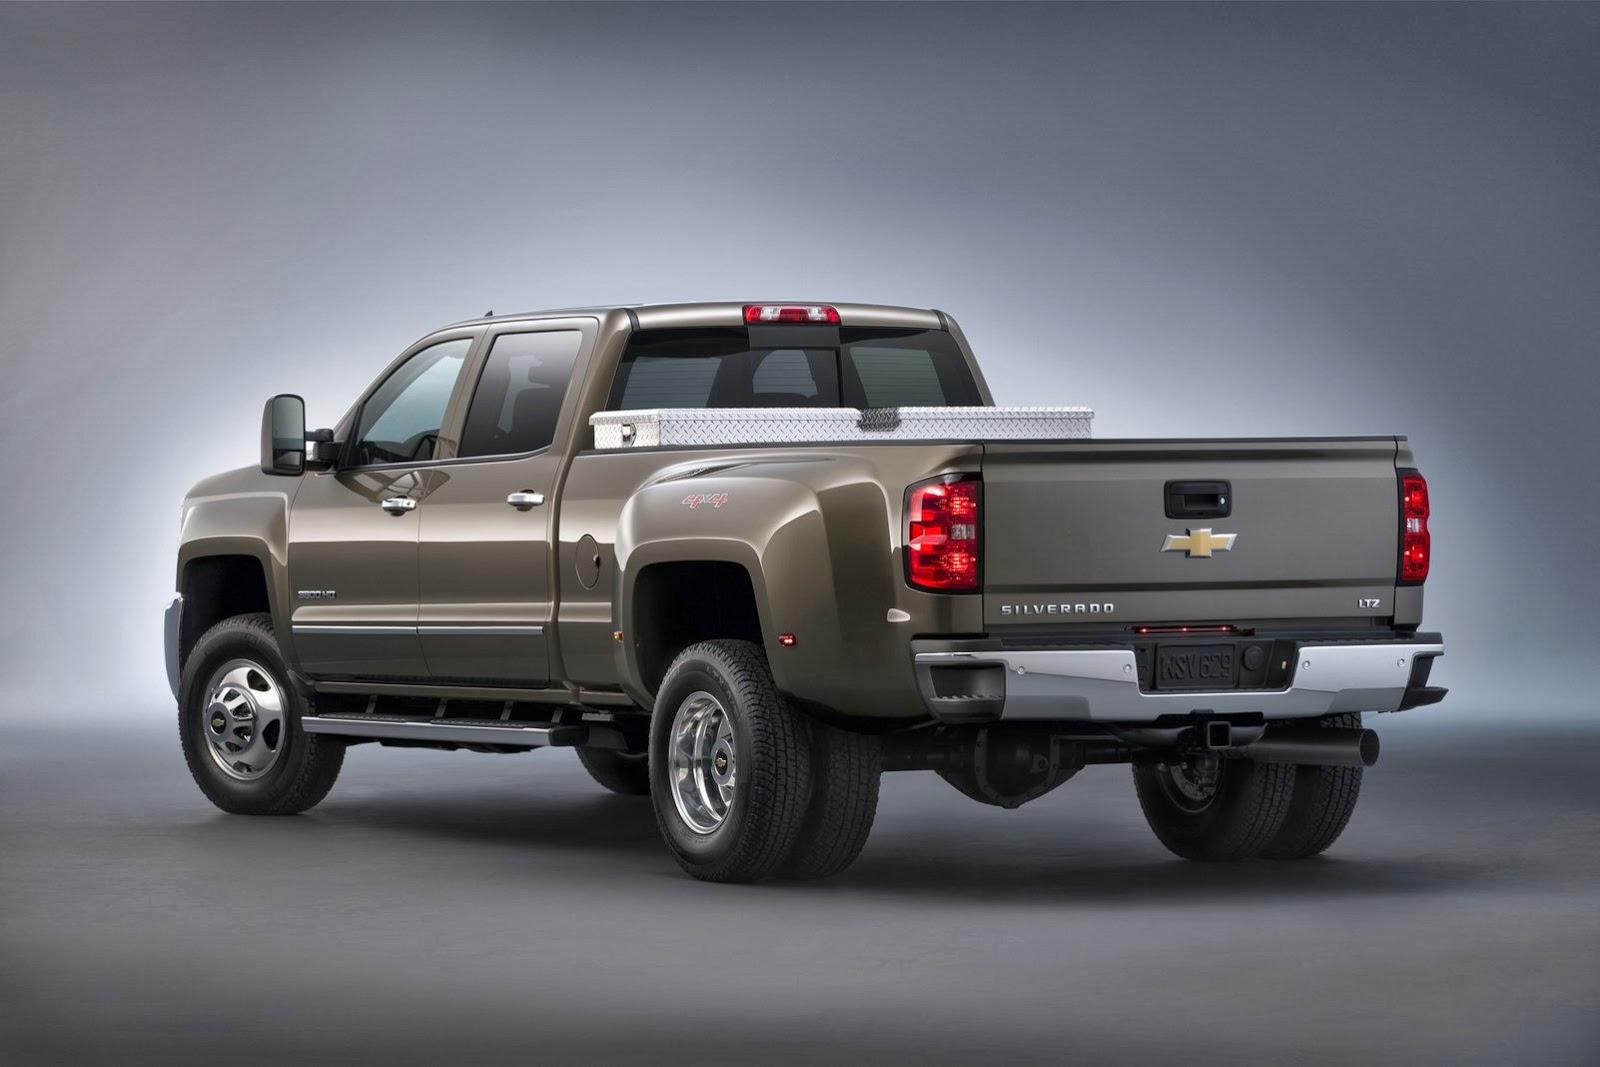 2015-Chevrolet-Silverado-3500-HD-9%25255B2%25255D.jpg